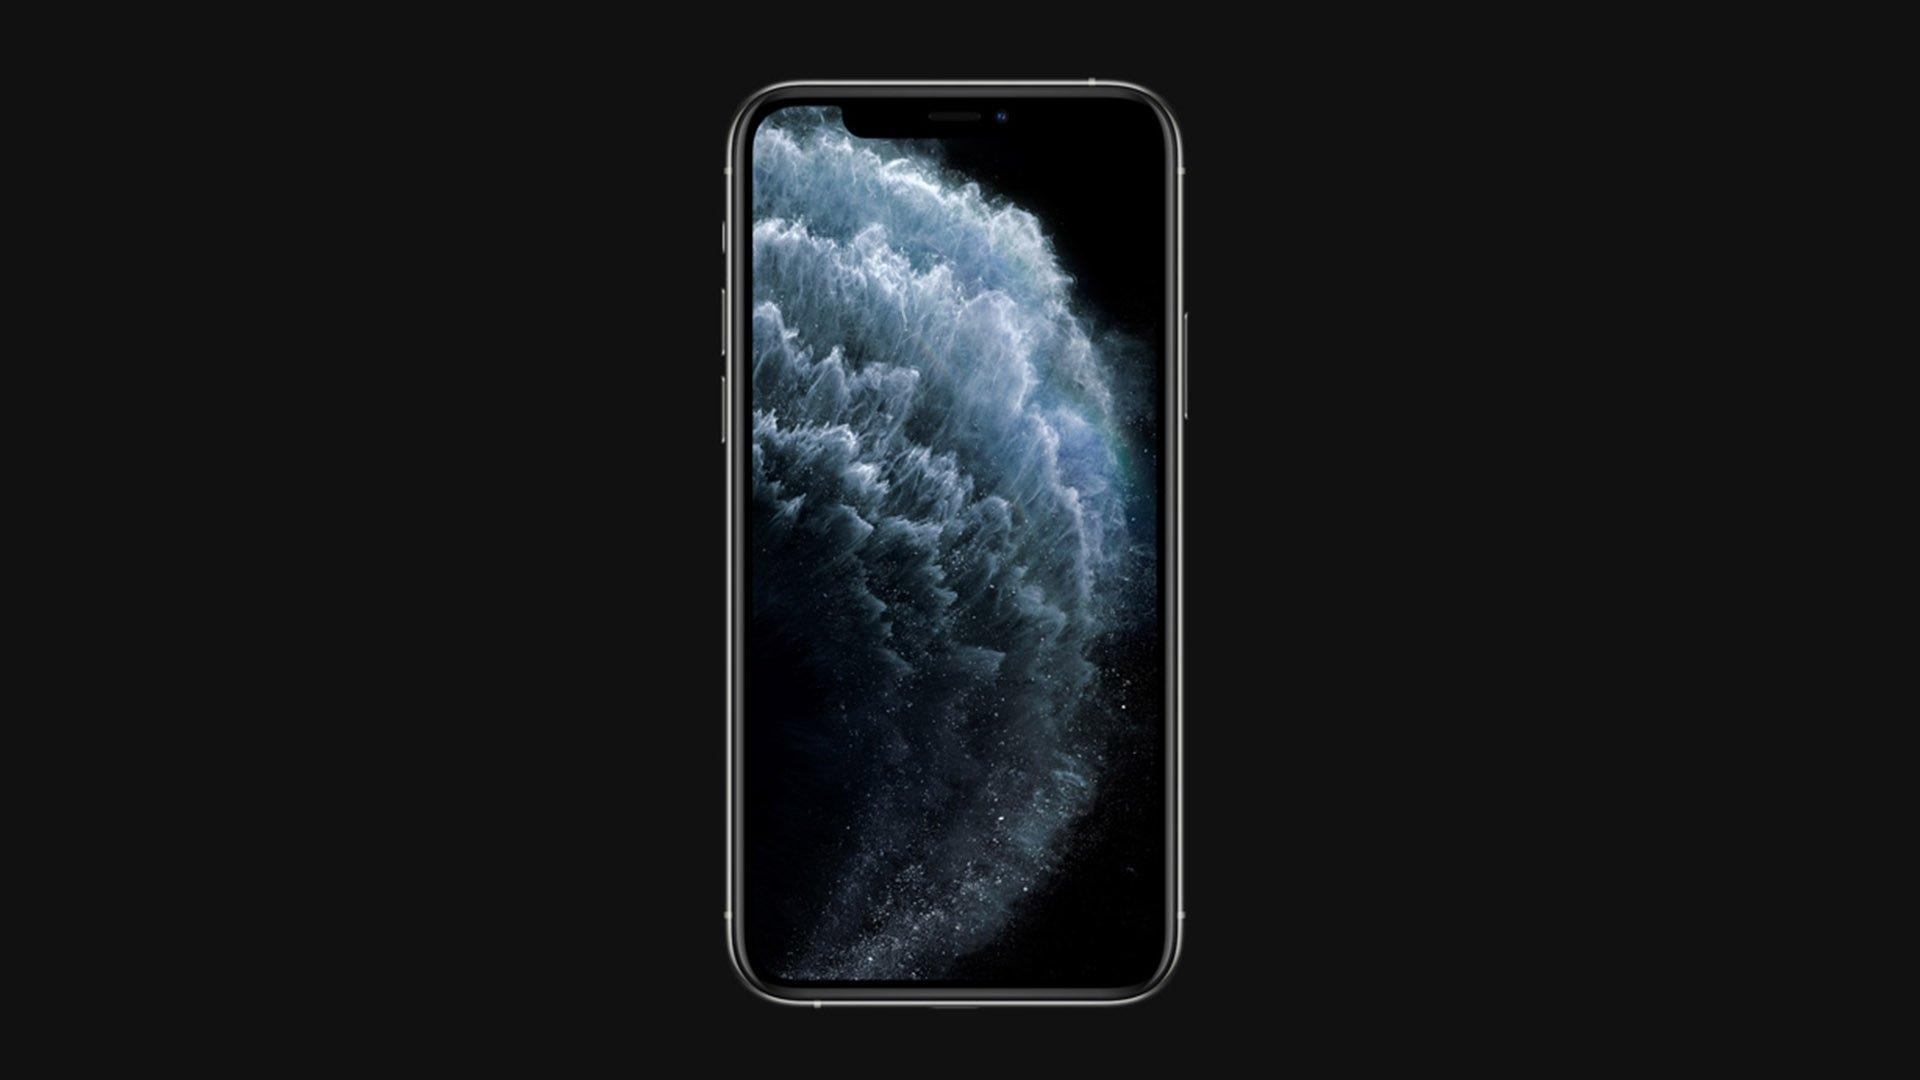 Iphone 11 pro max display